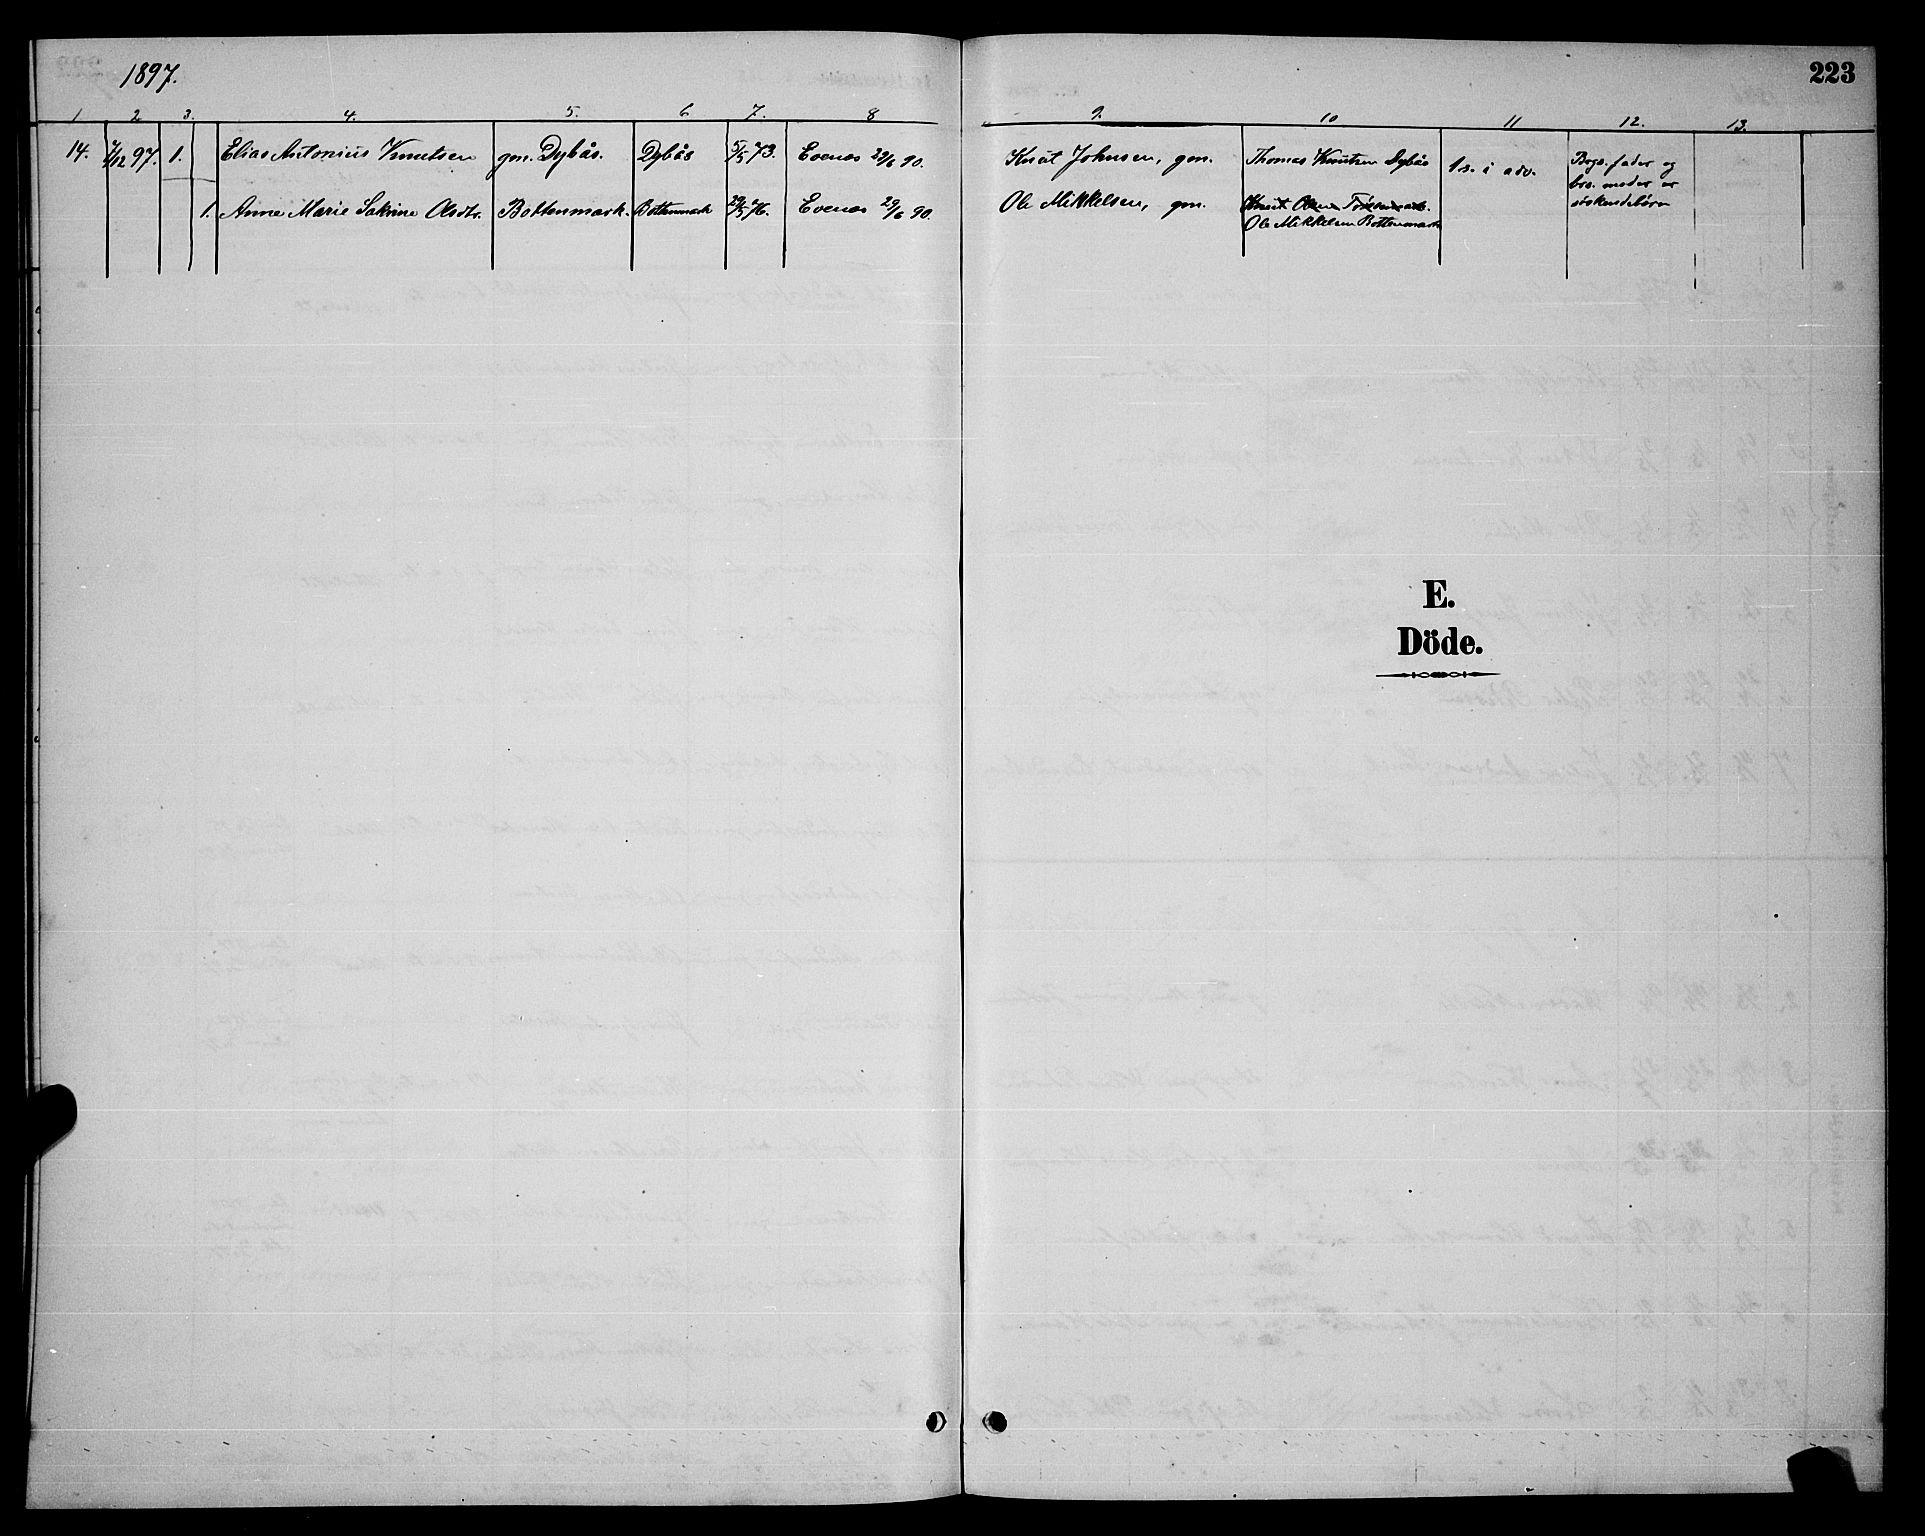 SAT, Ministerialprotokoller, klokkerbøker og fødselsregistre - Nordland, 863/L0914: Klokkerbok nr. 863C04, 1886-1897, s. 223